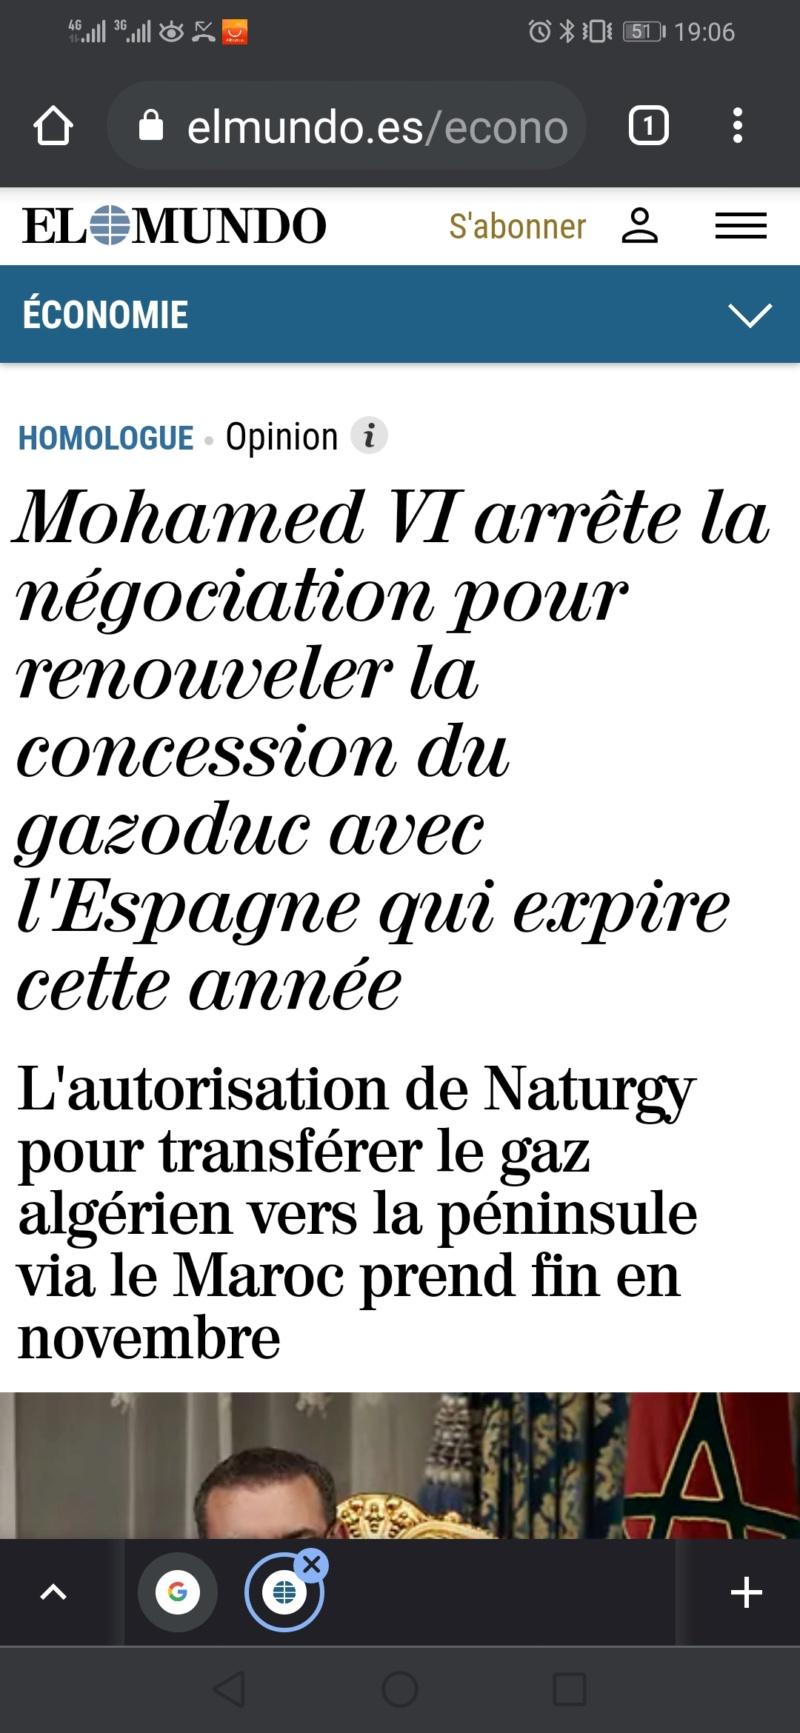 Diplomatie marocaine - Relations internationales - Page 27 Screen28